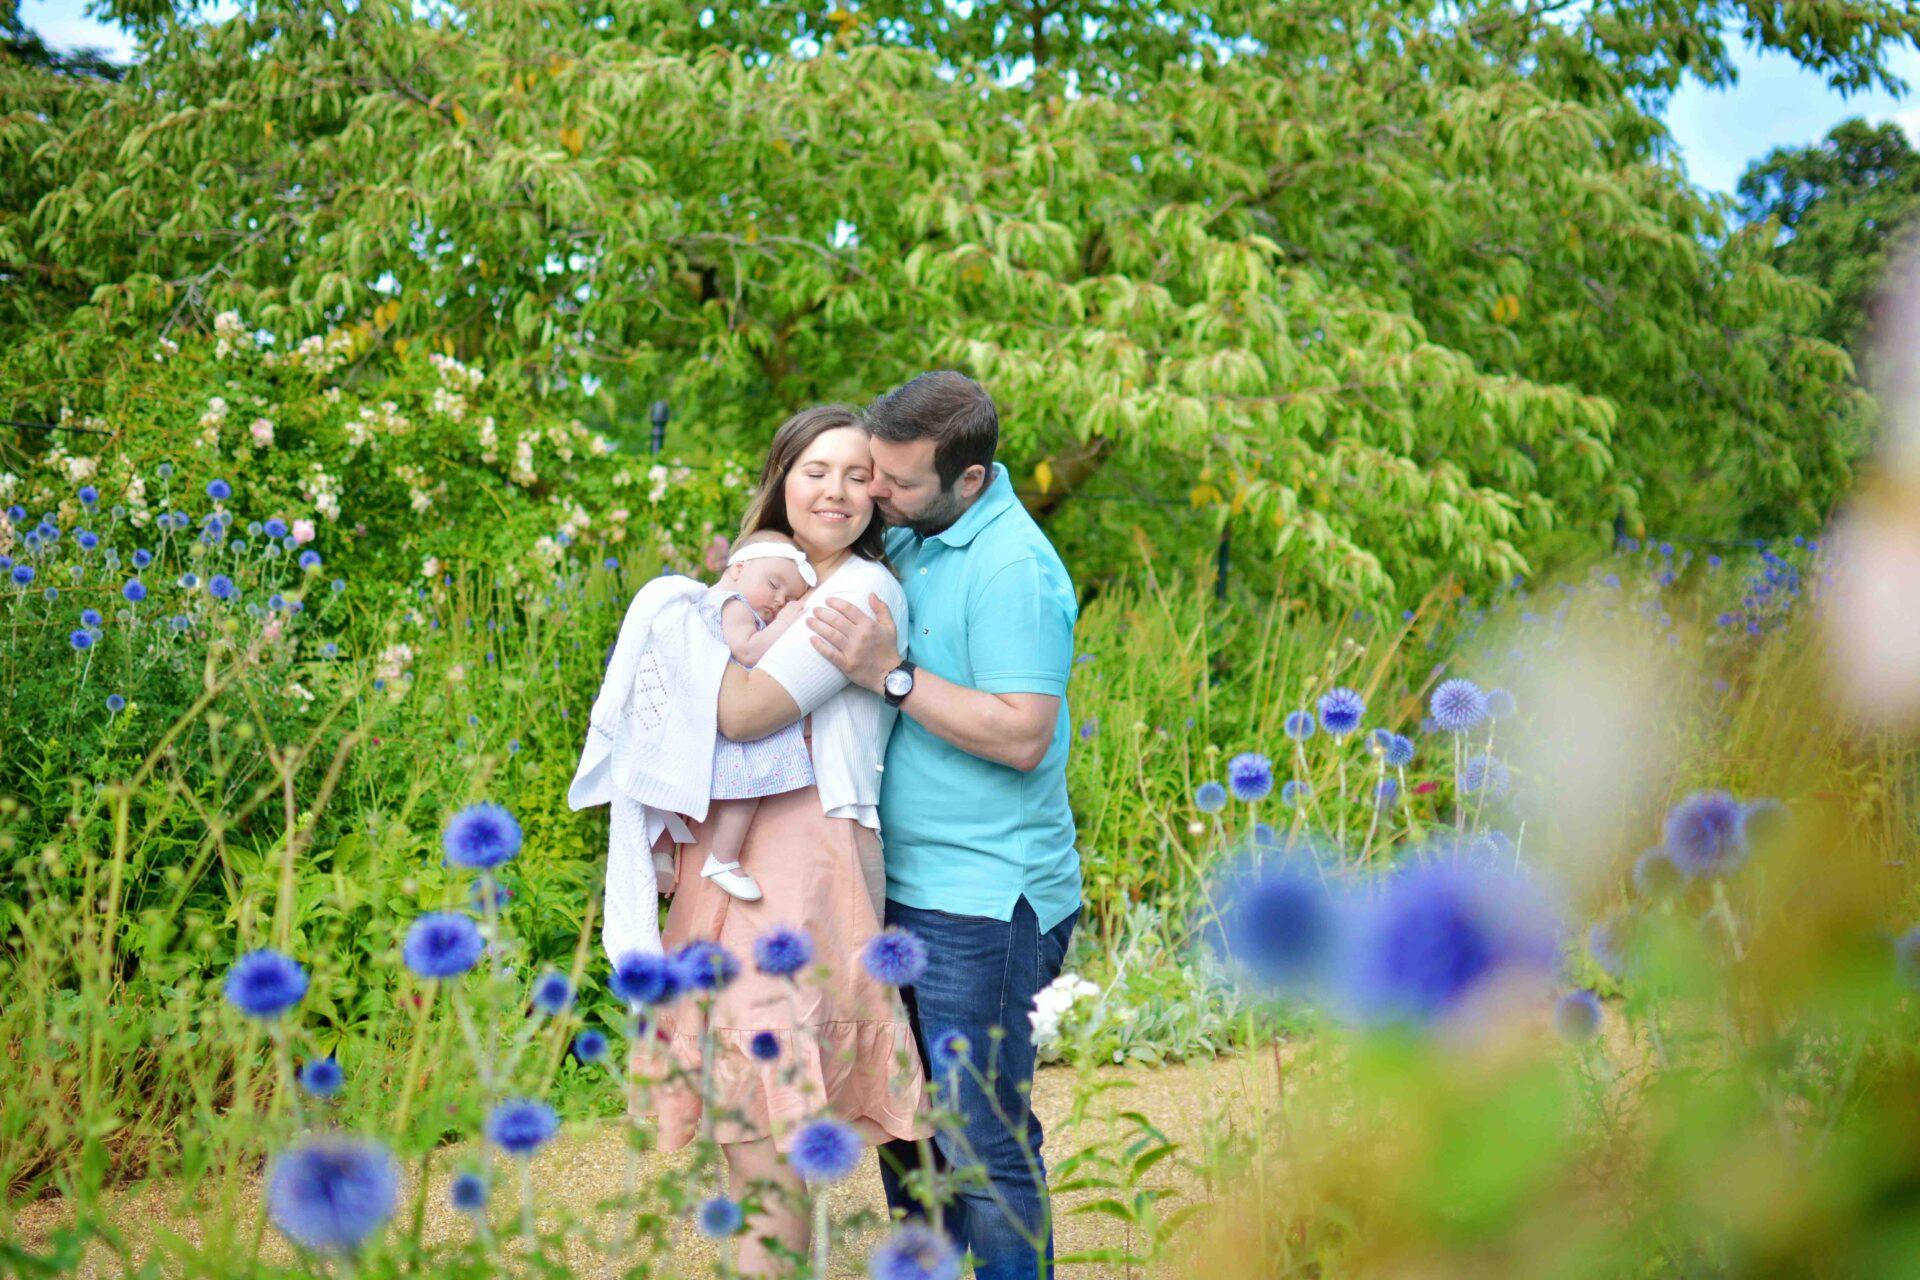 family photography in milton keynes buckinghamshire